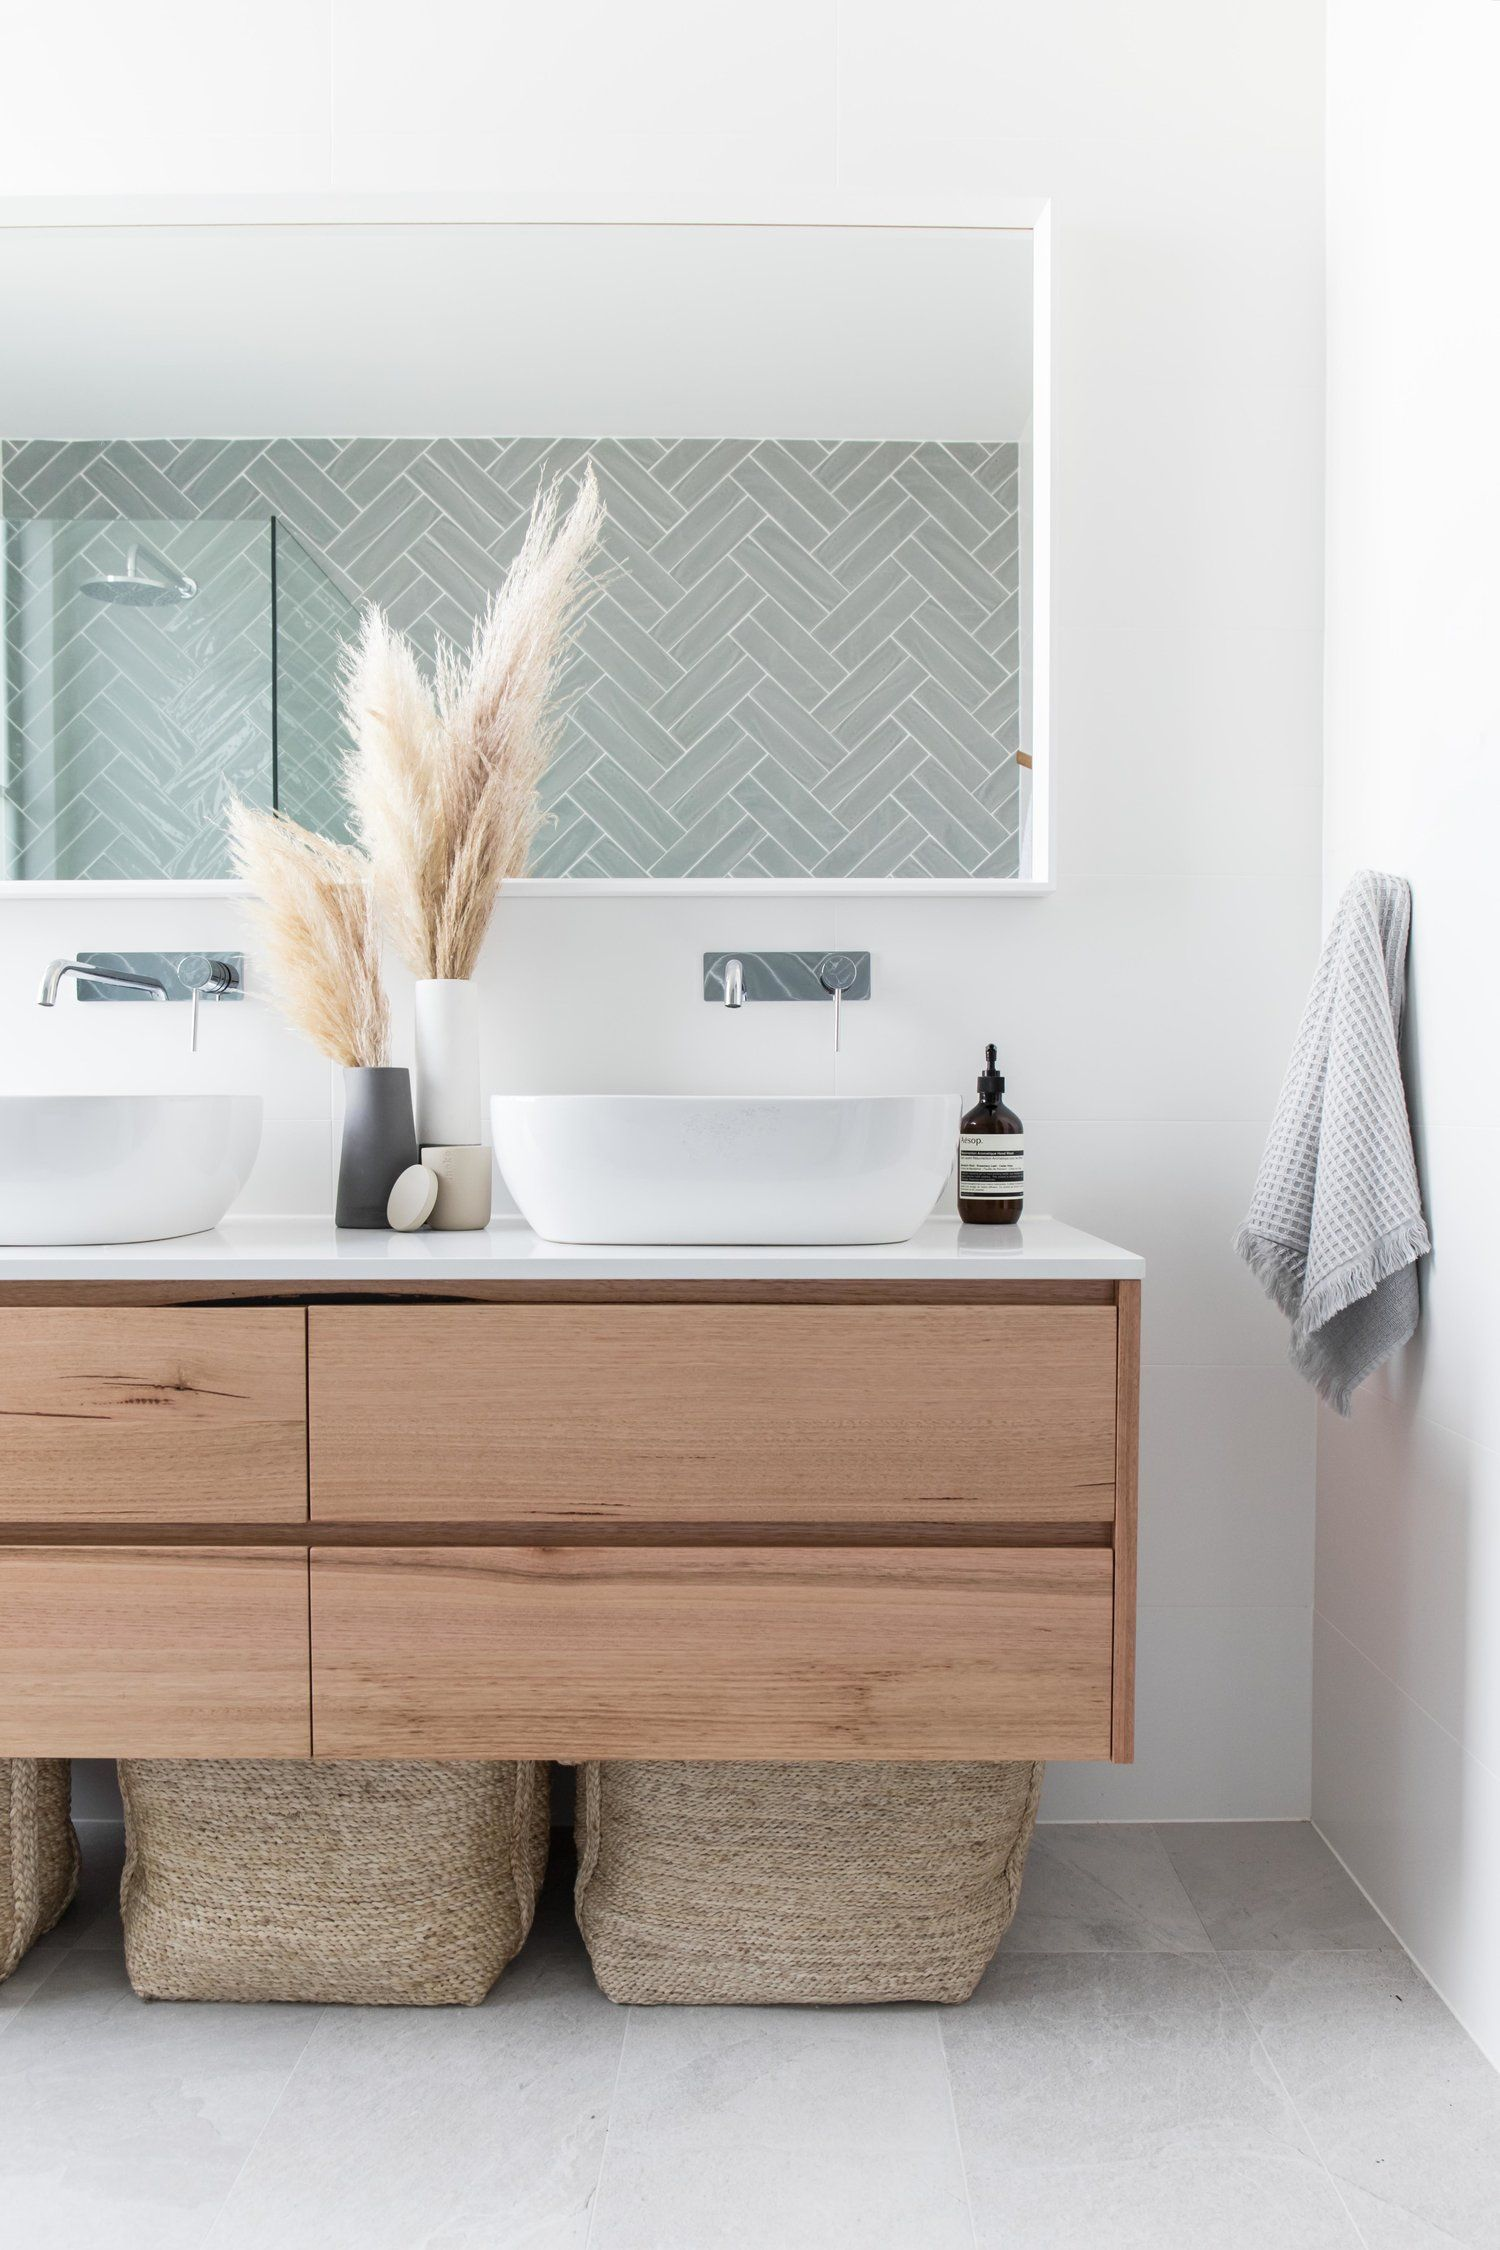 toiletandbathroomdesign   Bathroom vanity designs, Bathroom ...